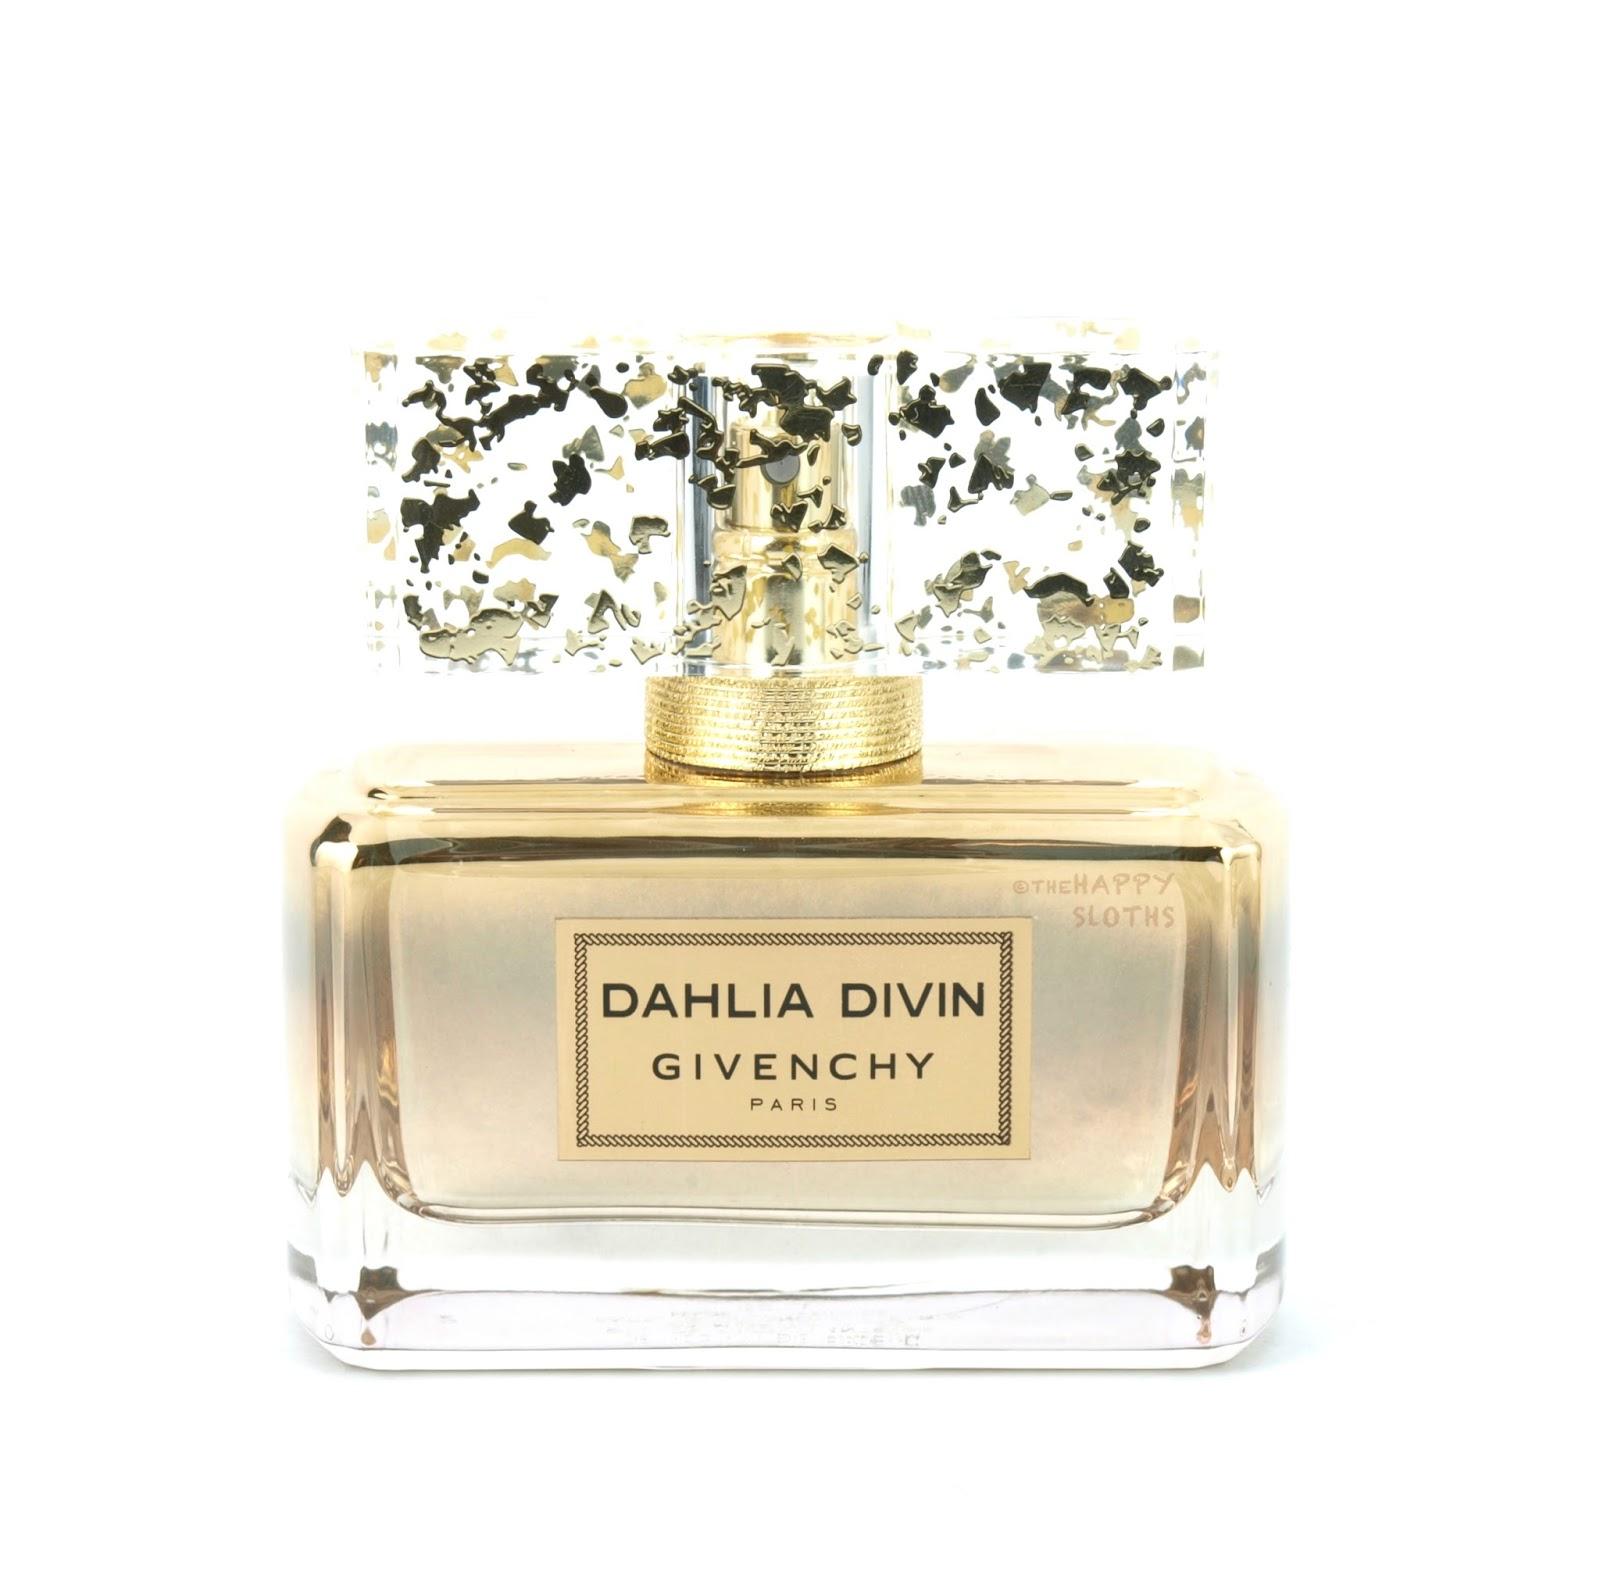 Givenchy Dahlia Divin Le Nectar de Parfum: Review